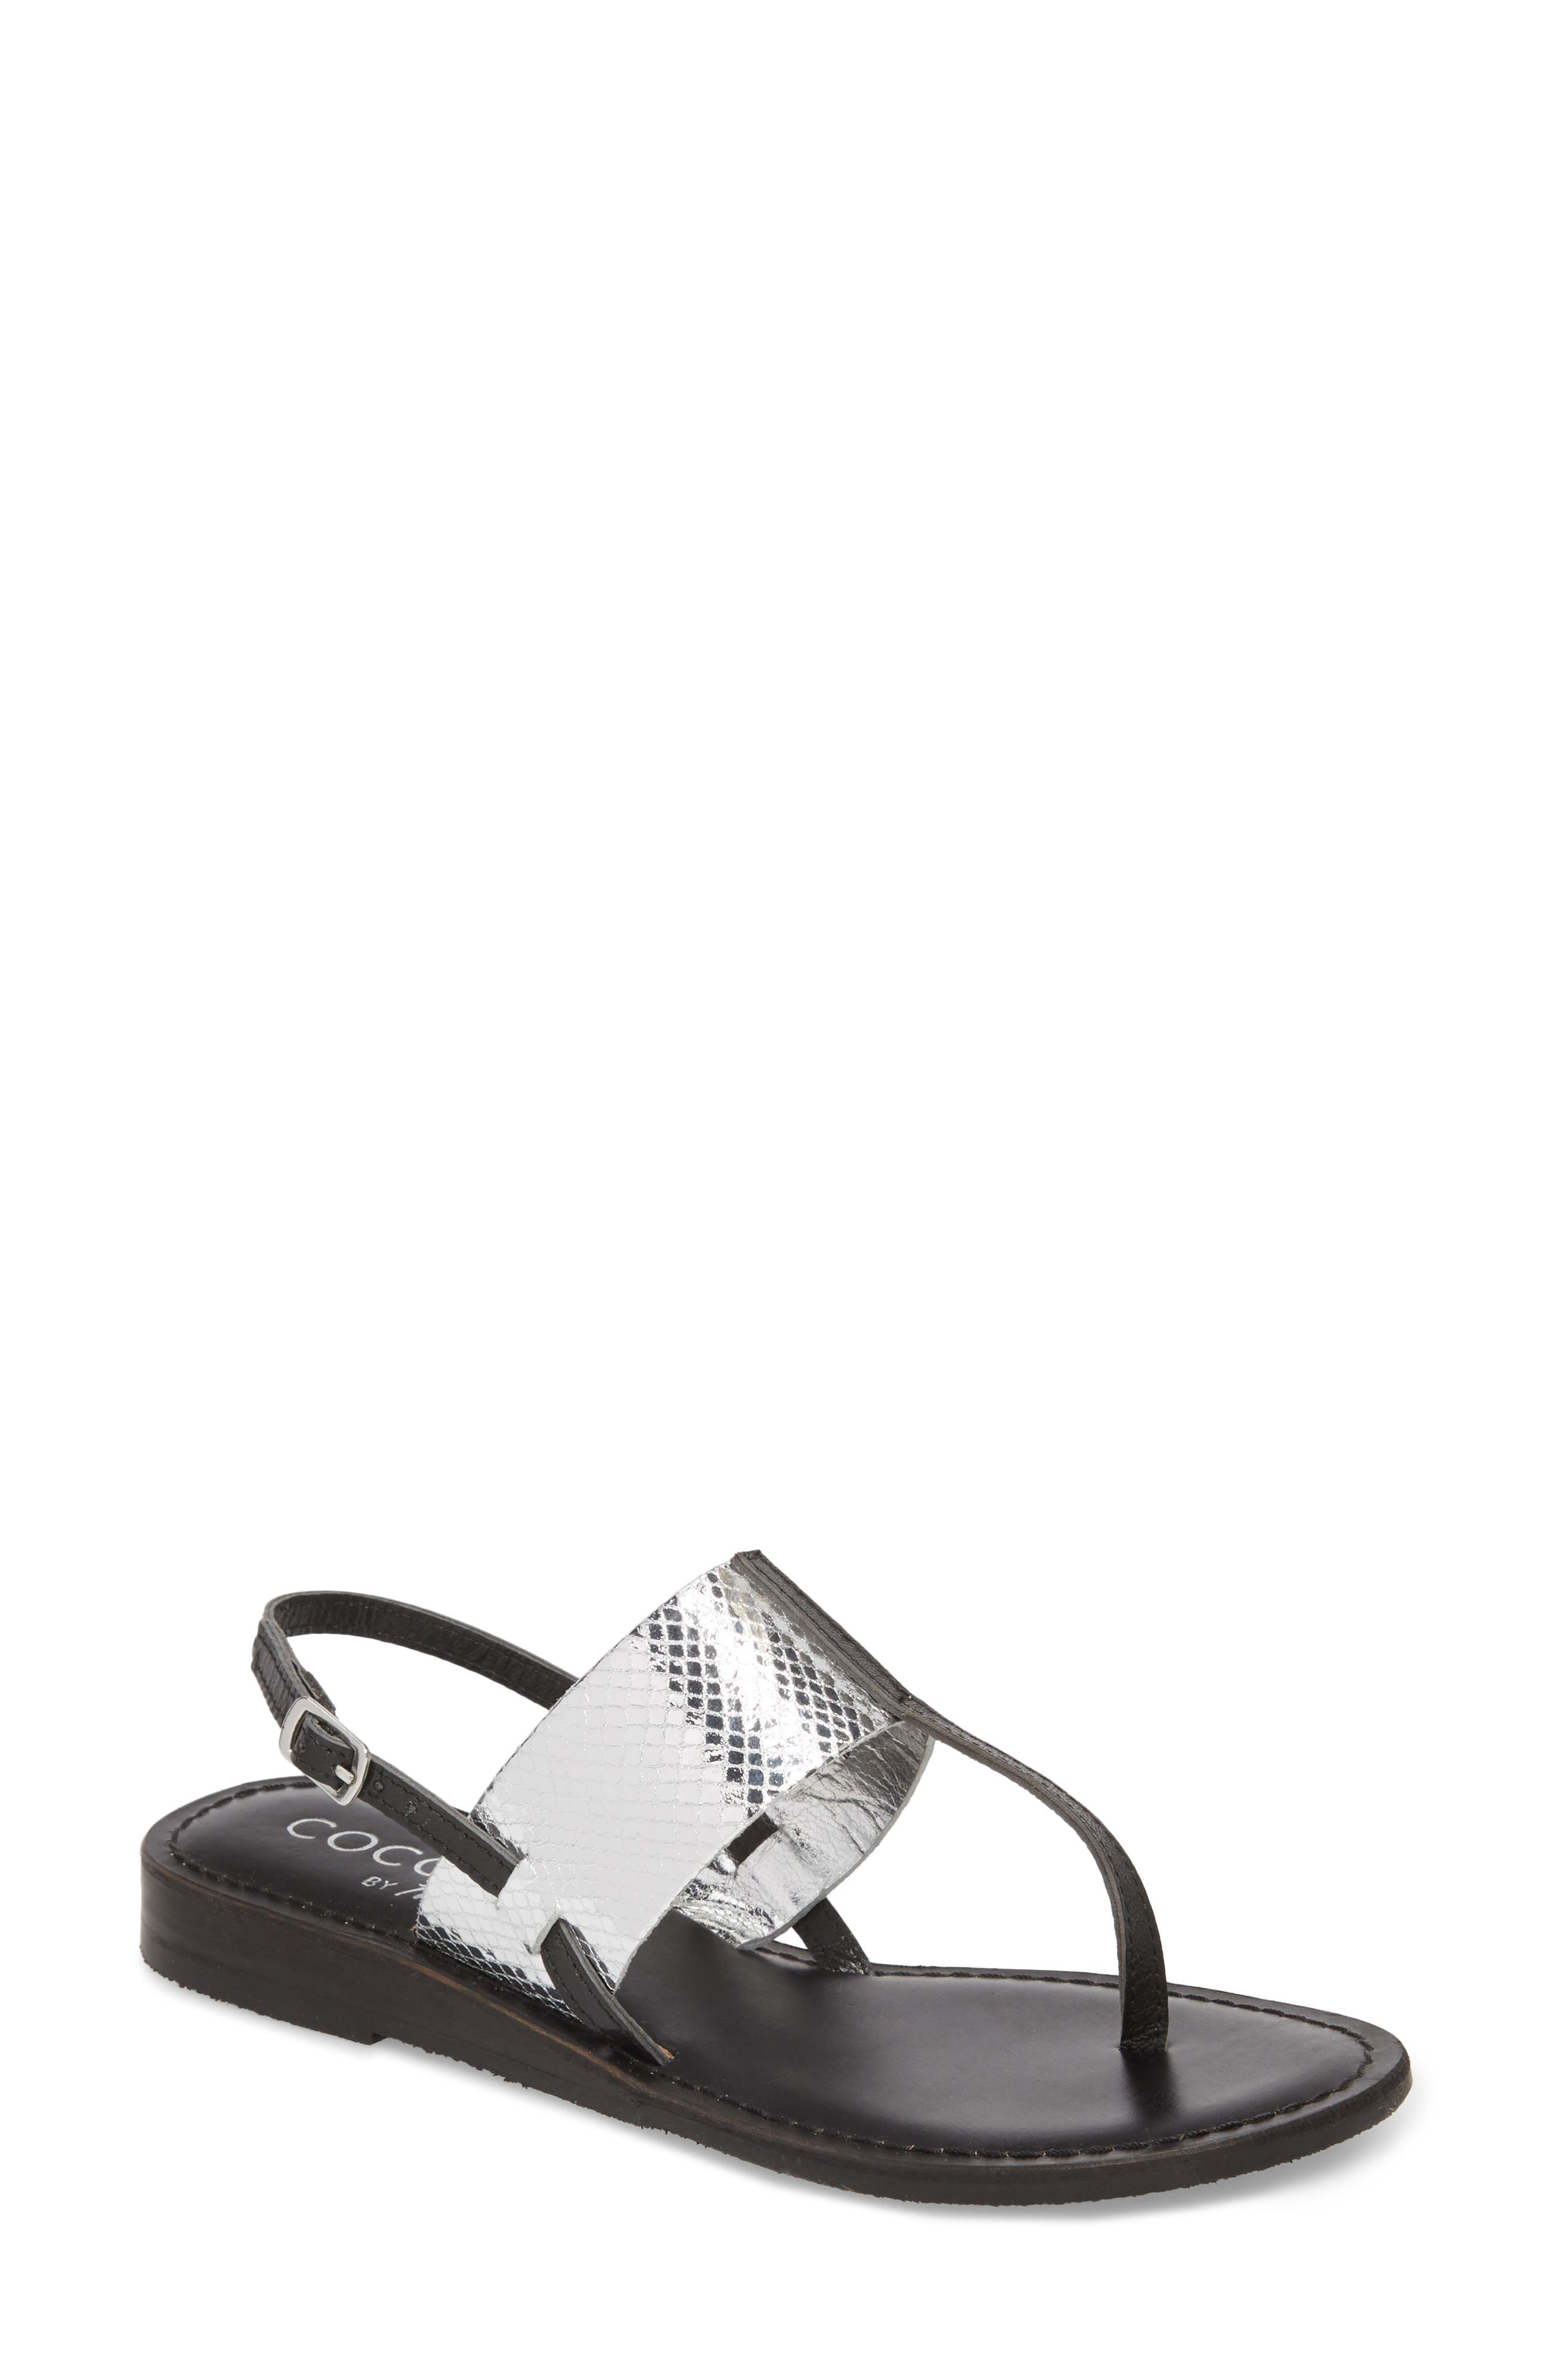 Valenti Sandal,                         Main,                         color, Black Leather